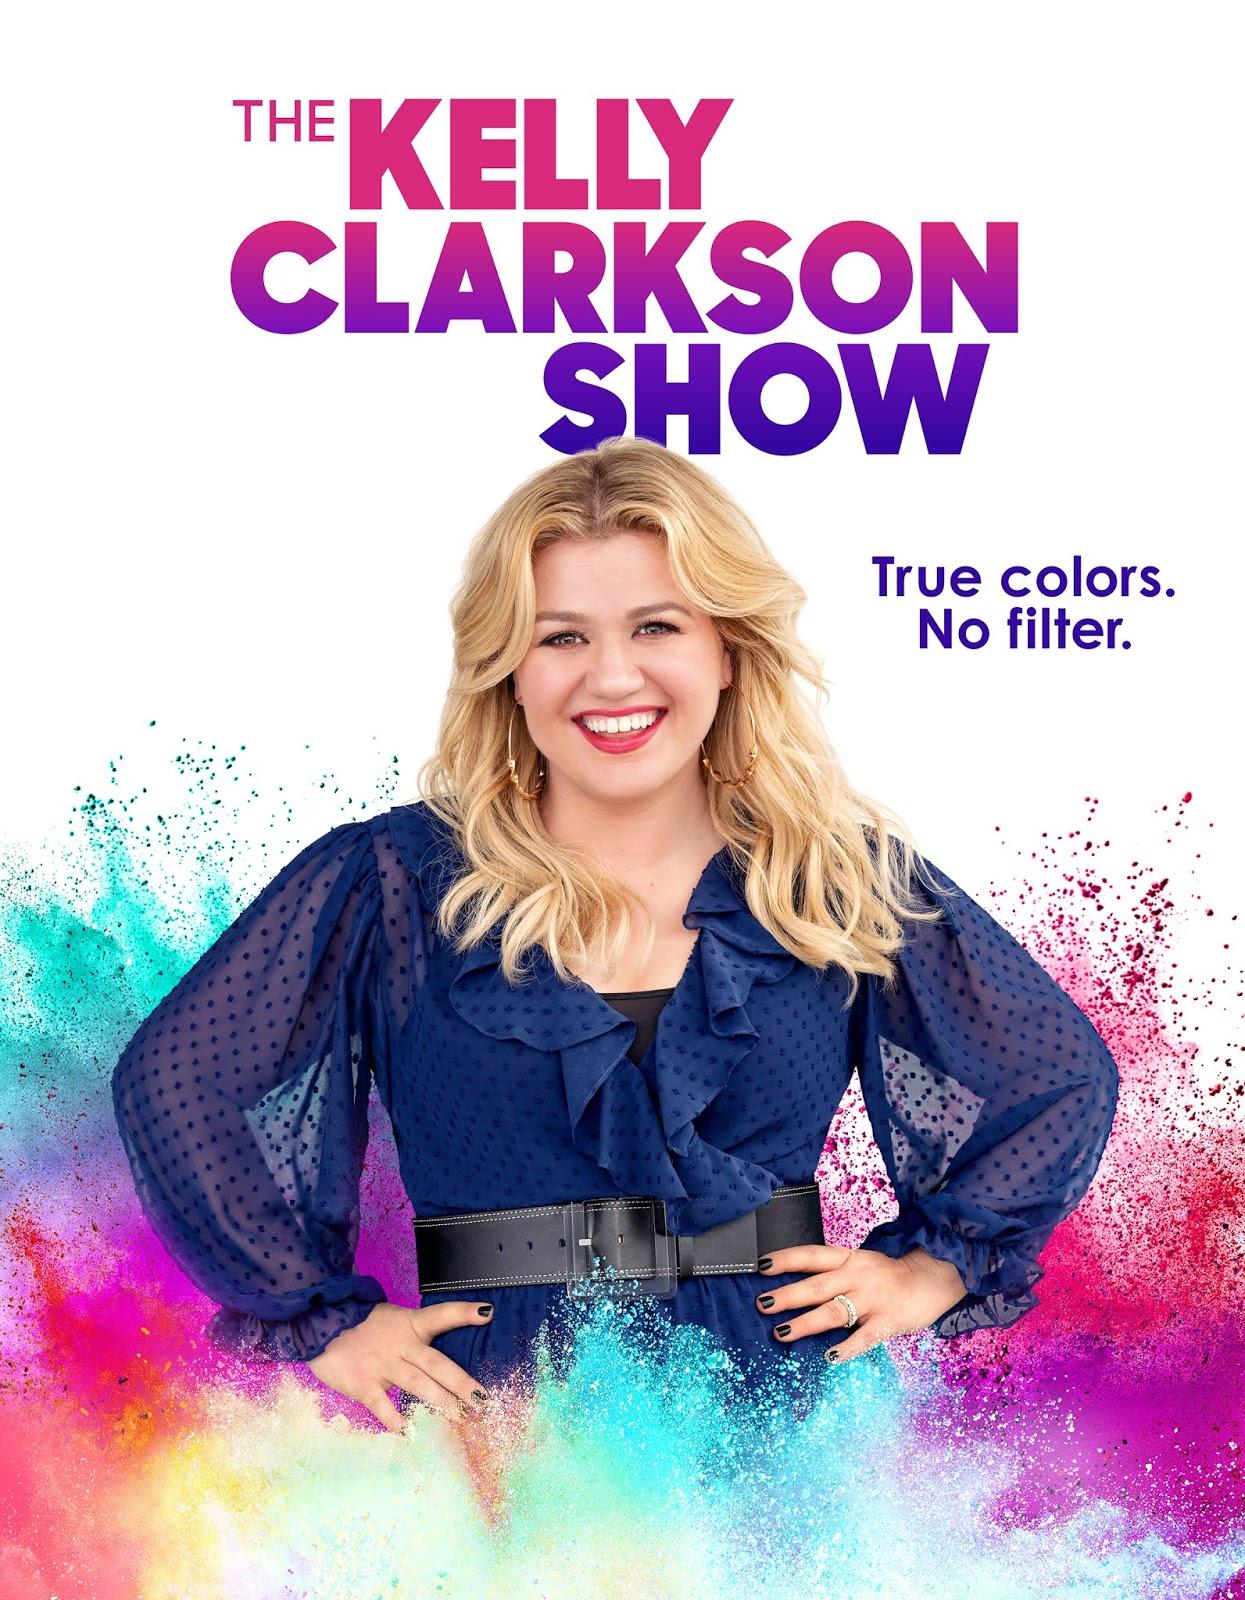 The.Kelly.Clarkson.Show.2019.10.09.Chloe.Grace.Moretz.WEB.x264-CookieMonster